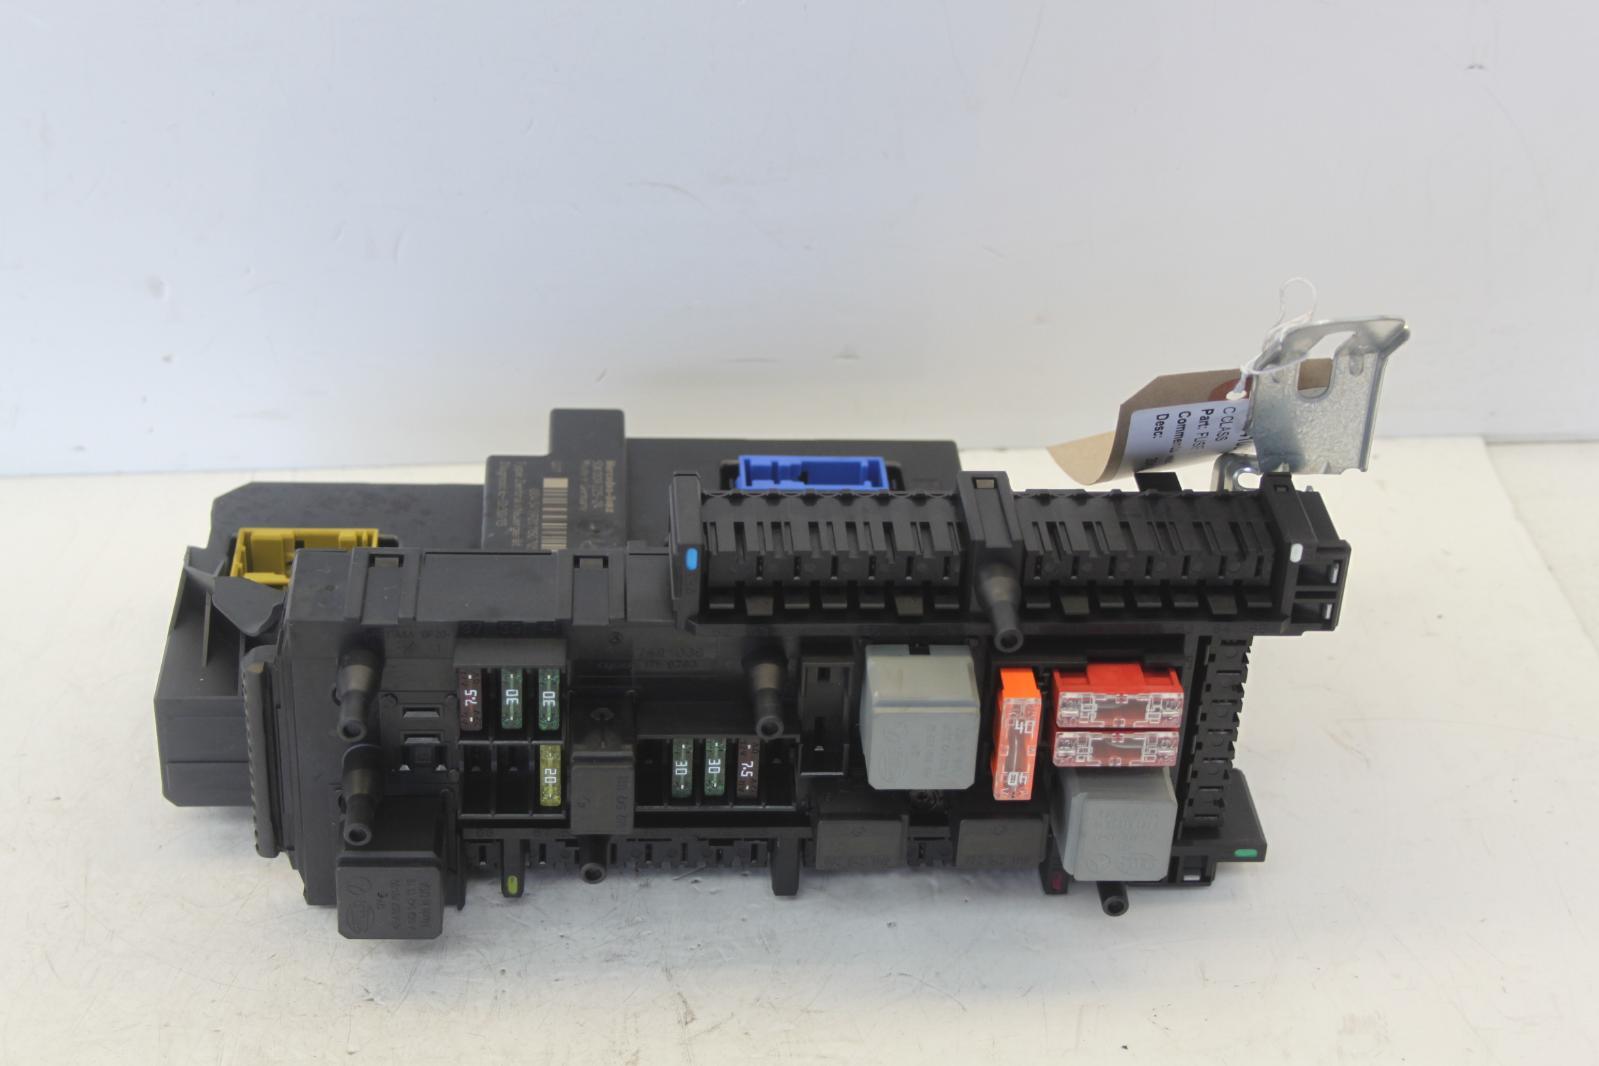 2007 w204 mercedes c class c220 sam unit fuse box 5dk00922524 ebay